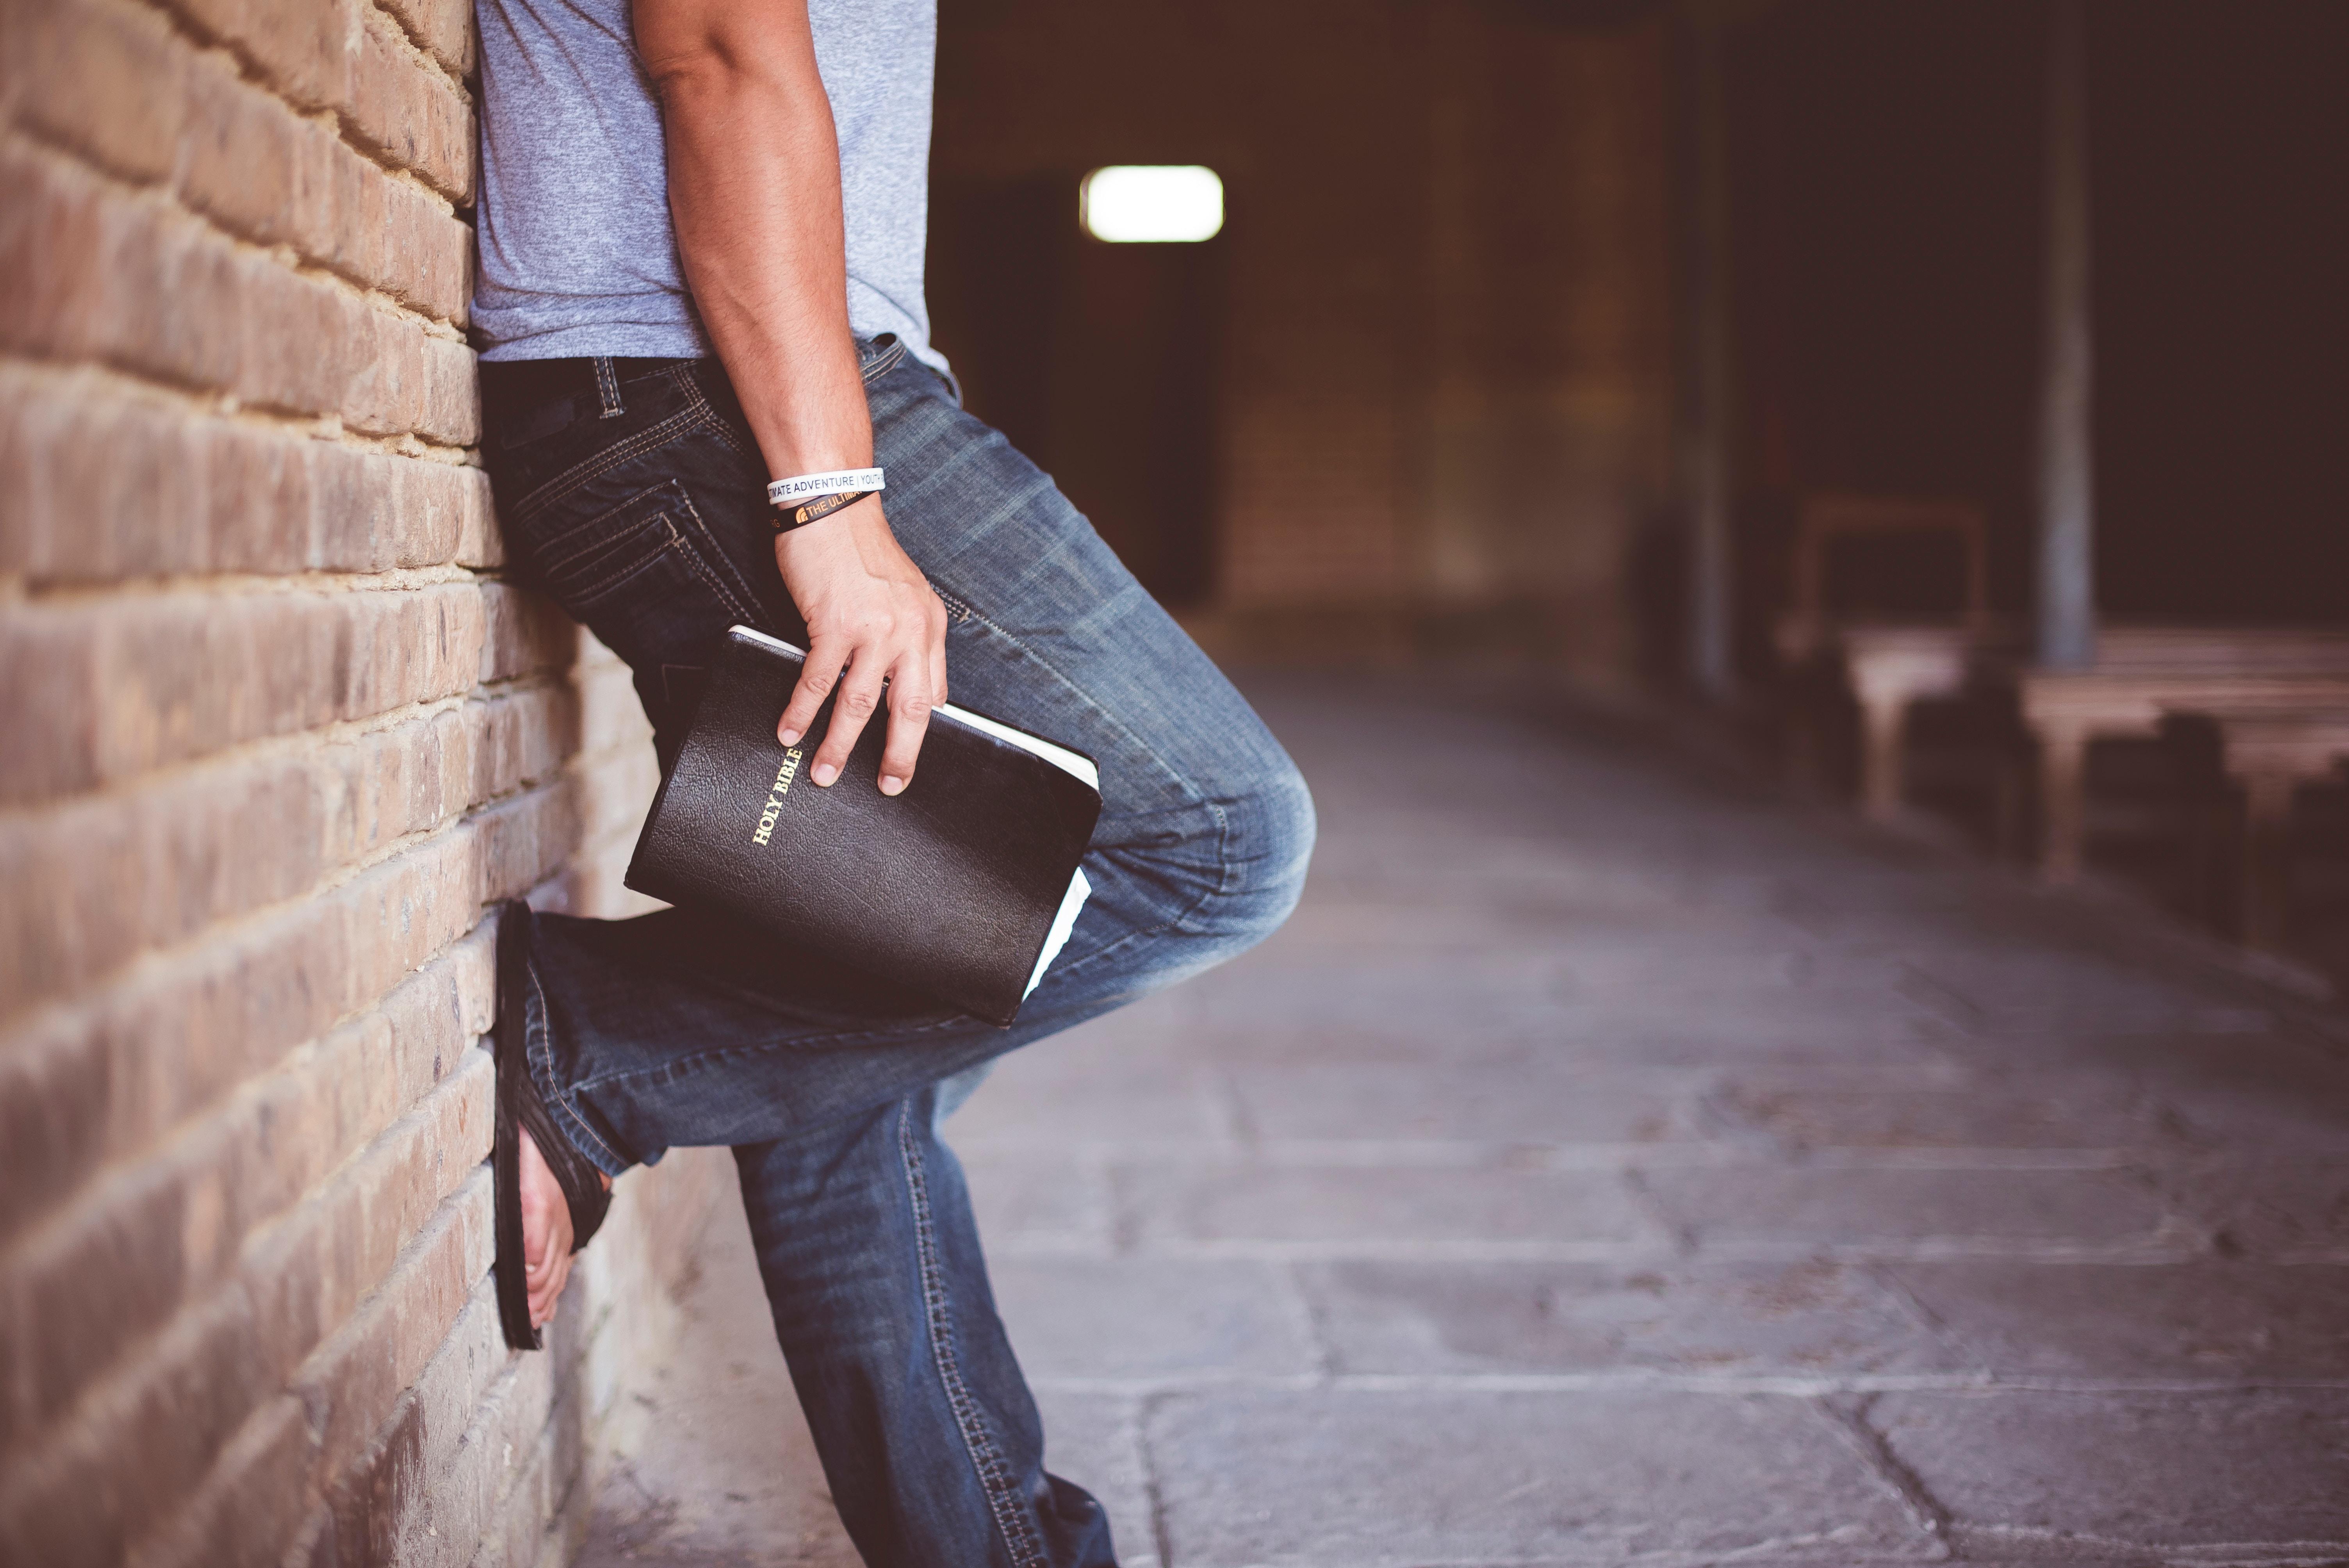 bible, wall, hand, man, boy